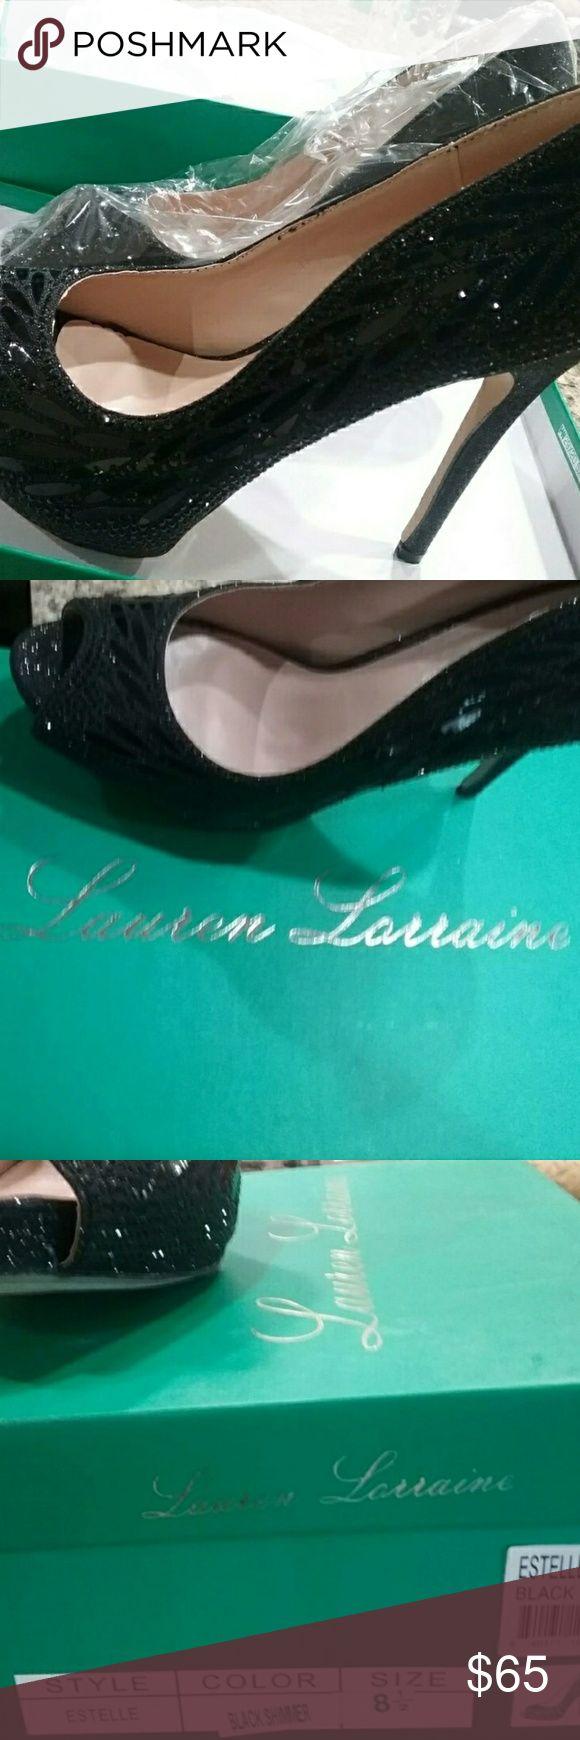 "Peep Toe Platform Pump - Lauren Lorraine Brand new - still in box Peep Toe Platform 2 Approx. 4.5"" heel. 1""platform  Very beautiful  Size 8.5 Leaf-like embellished detail Glitter Shoes Platforms"